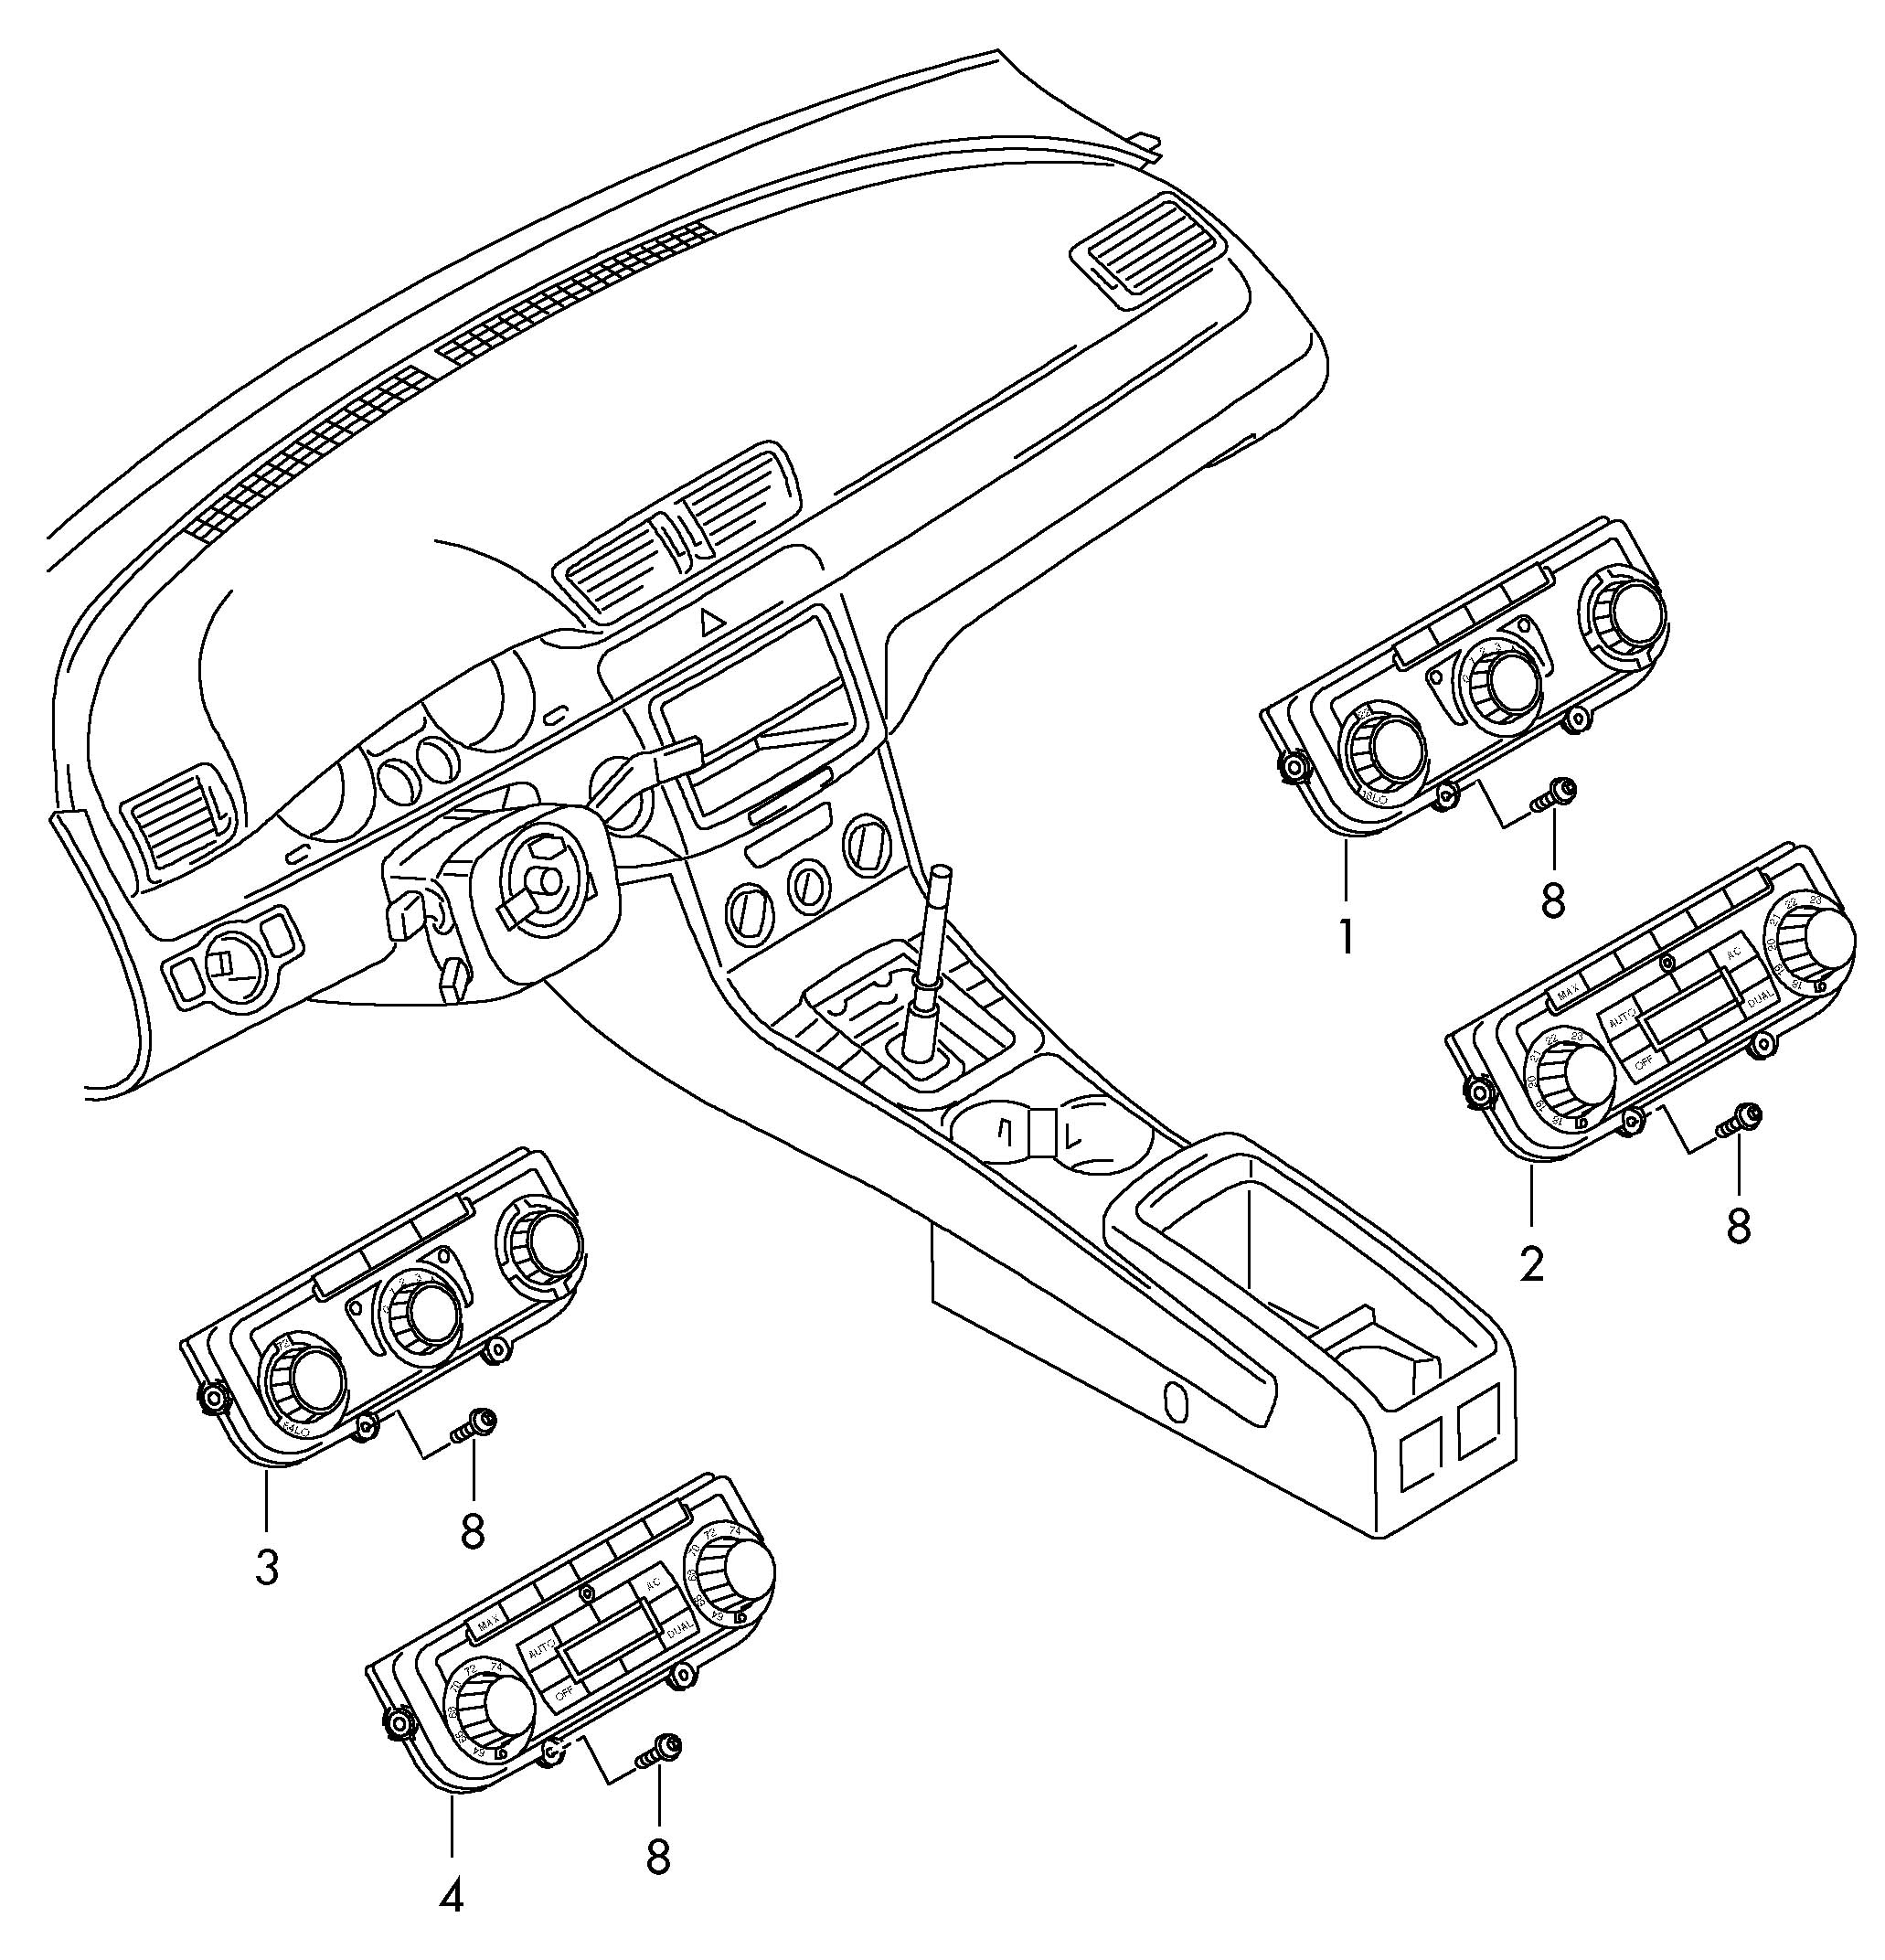 Volkswagen (VW) Passat CC Display and operating unit